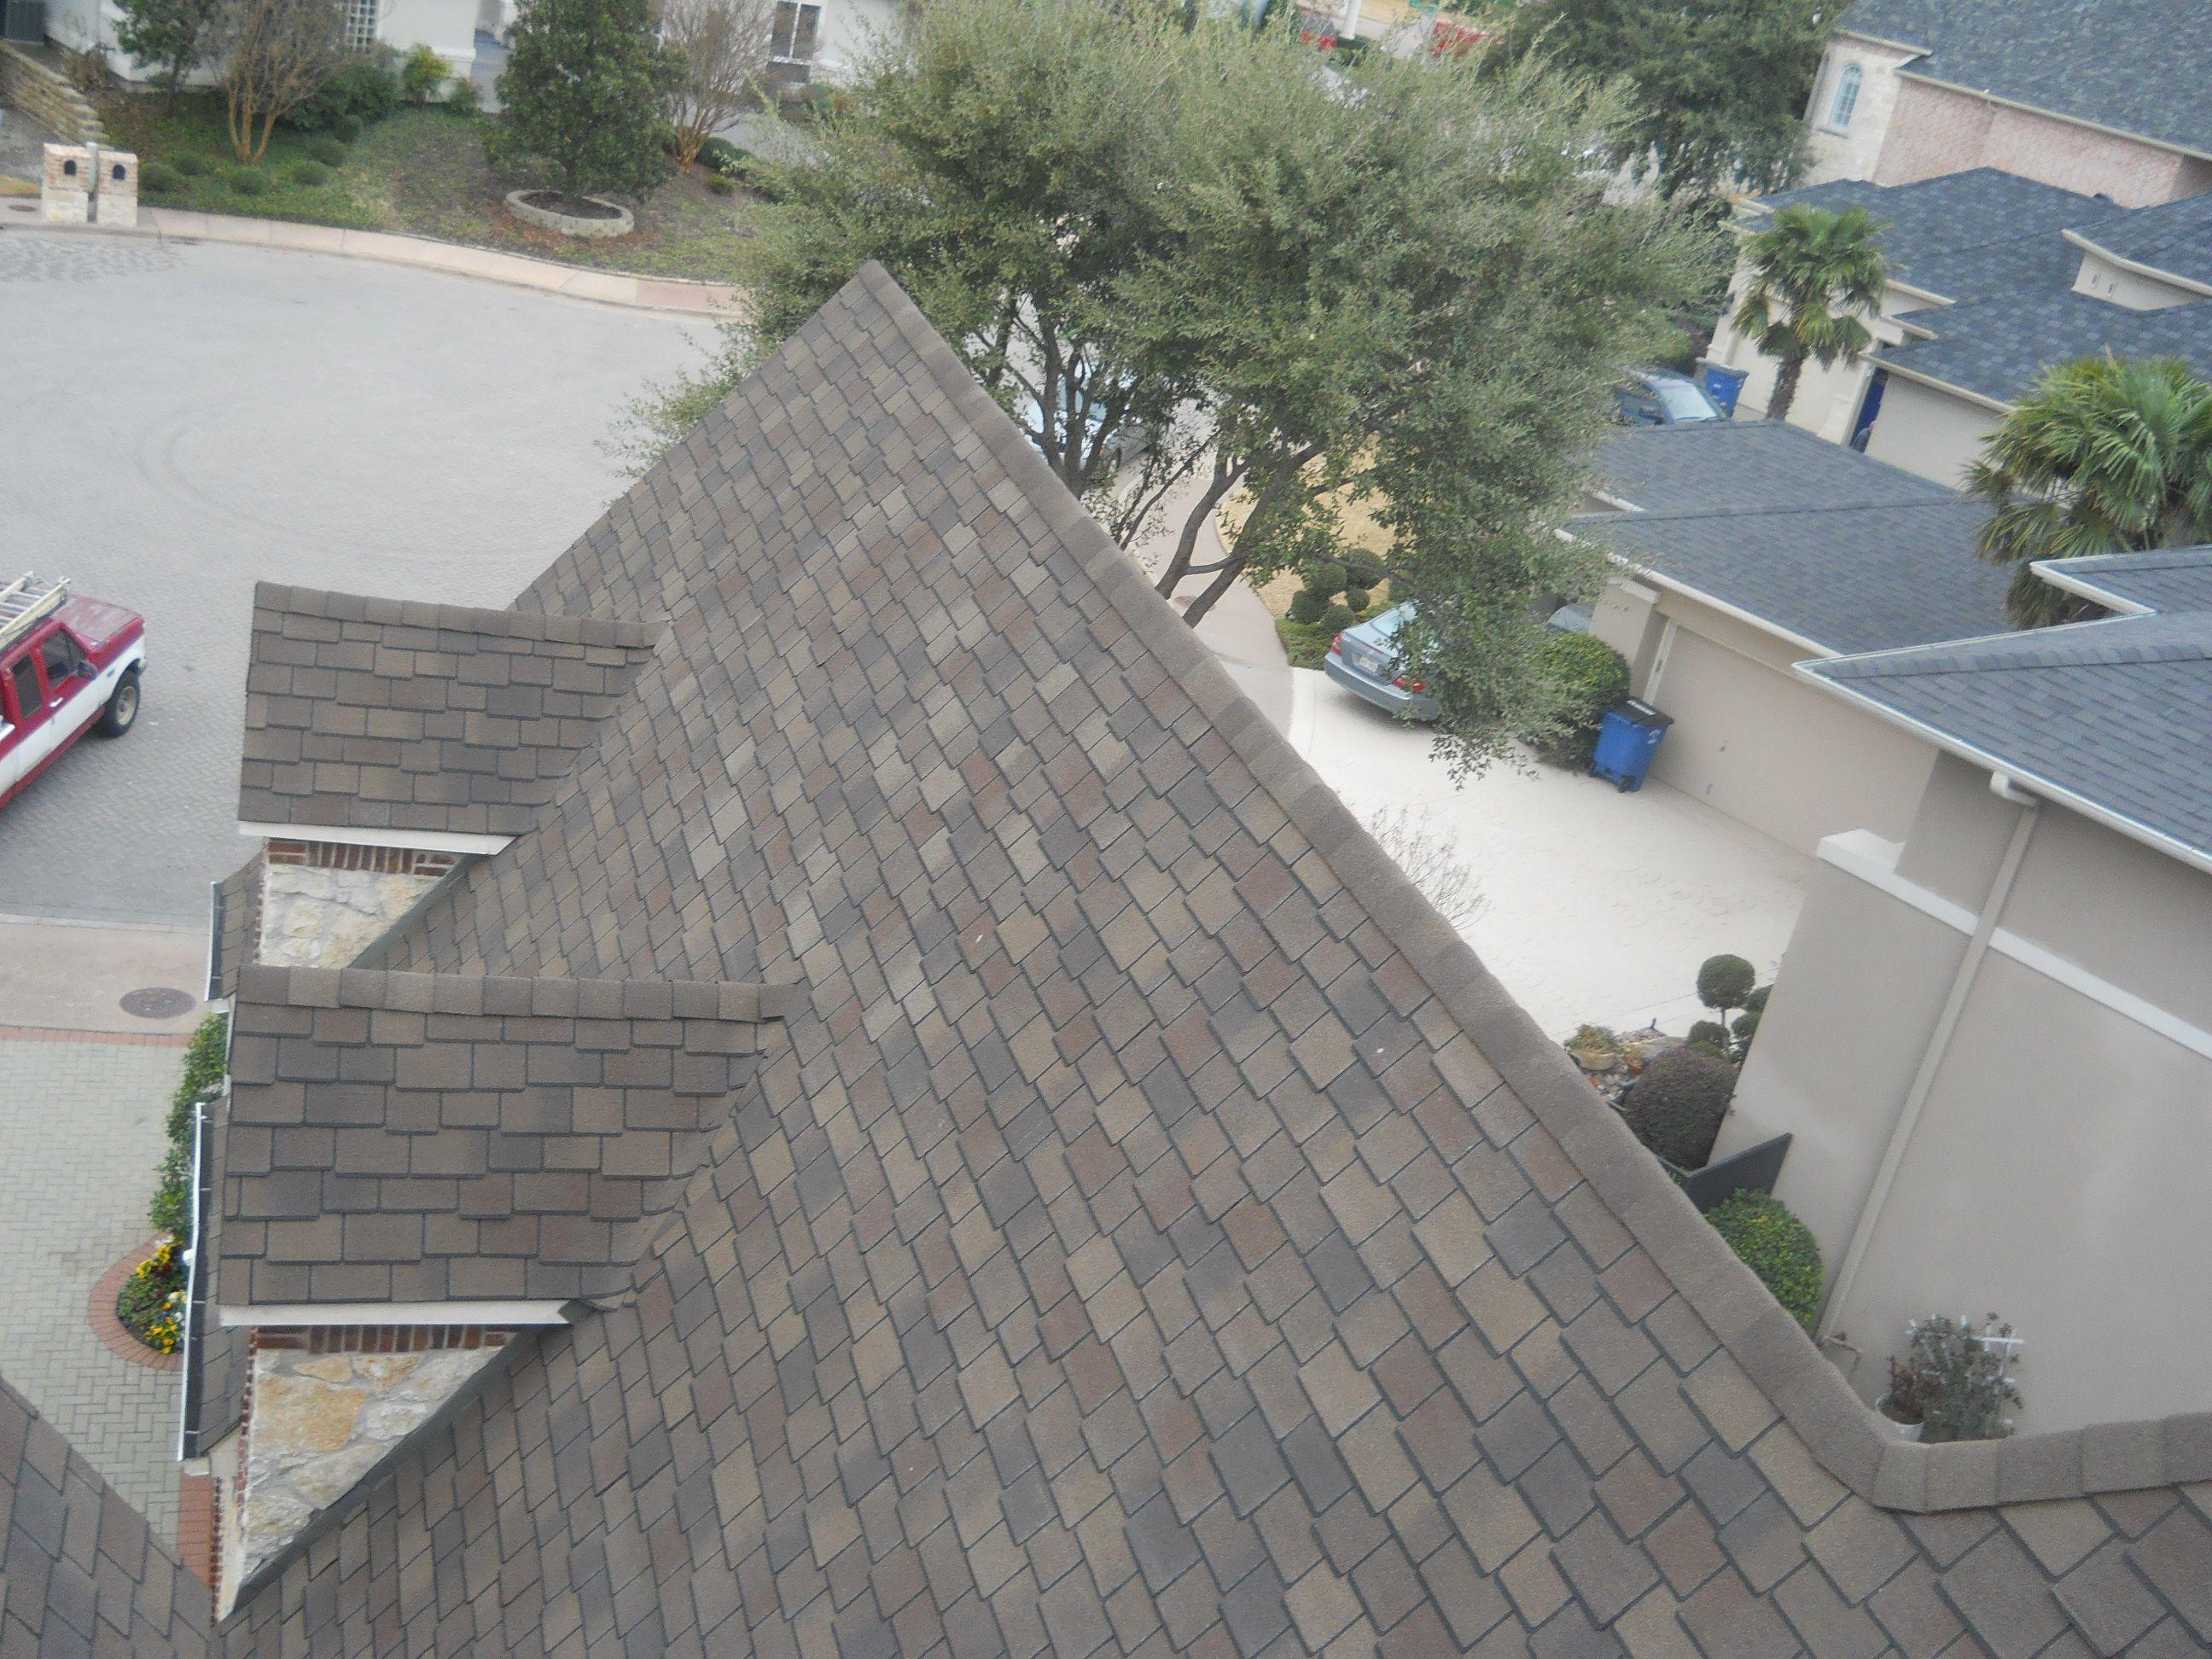 Dallas Roofing Contractor Roofers Dallas Roofing Roofing Contractors Design Remodel